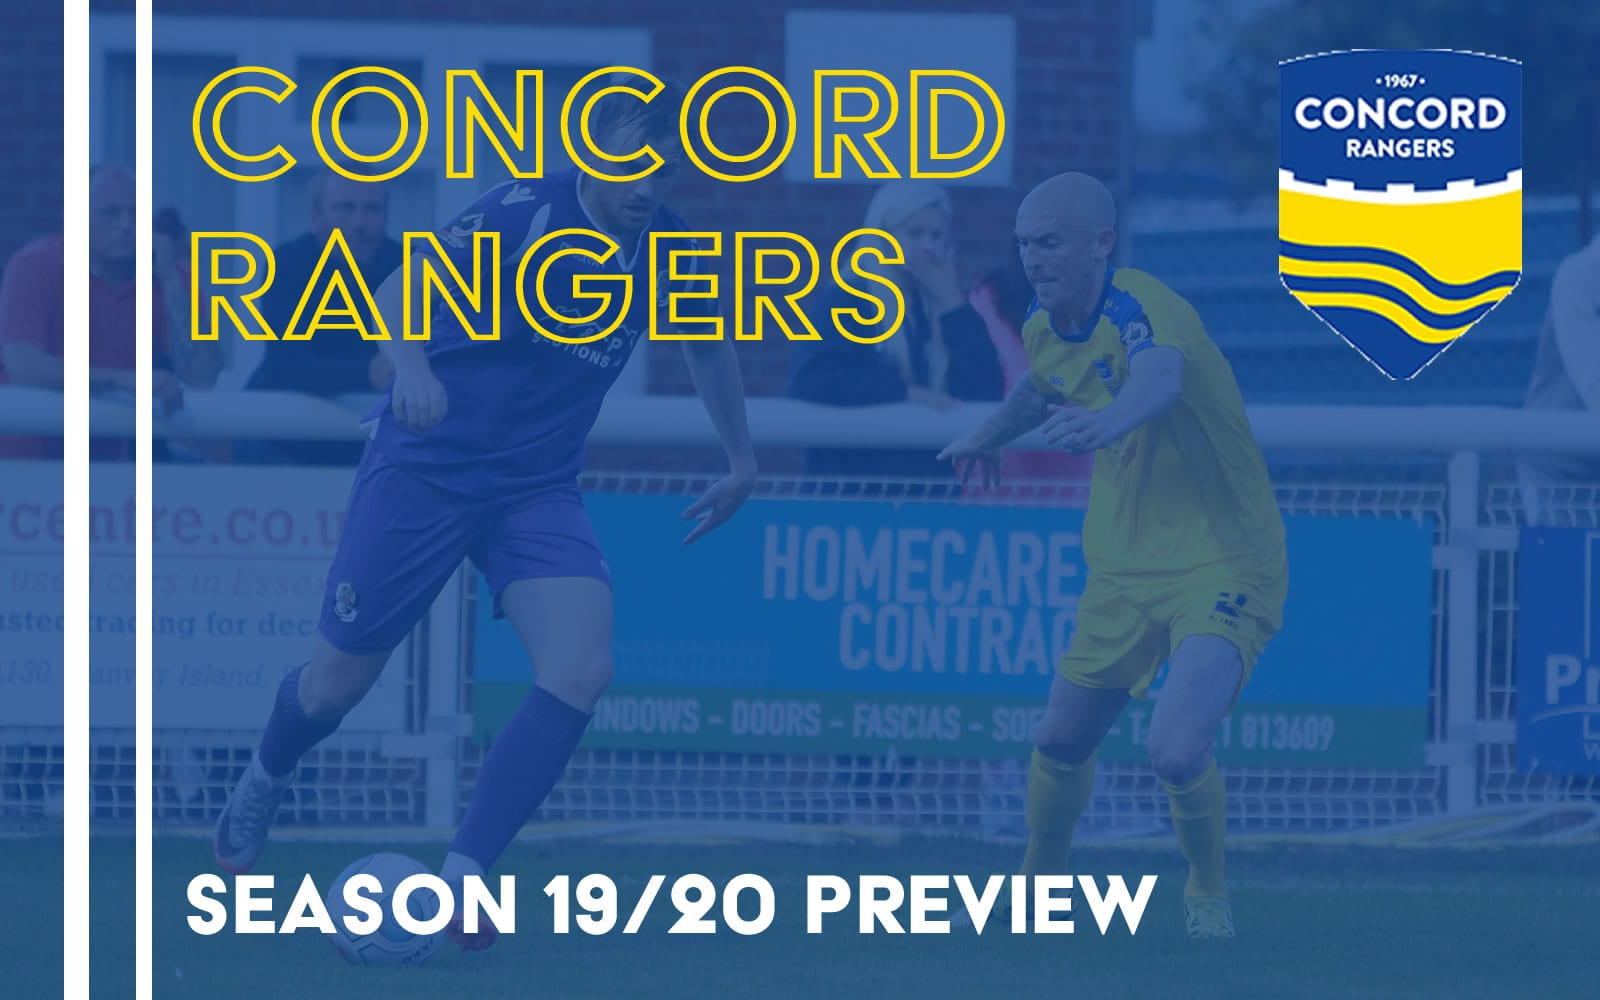 Season Preview: Concord Rangers